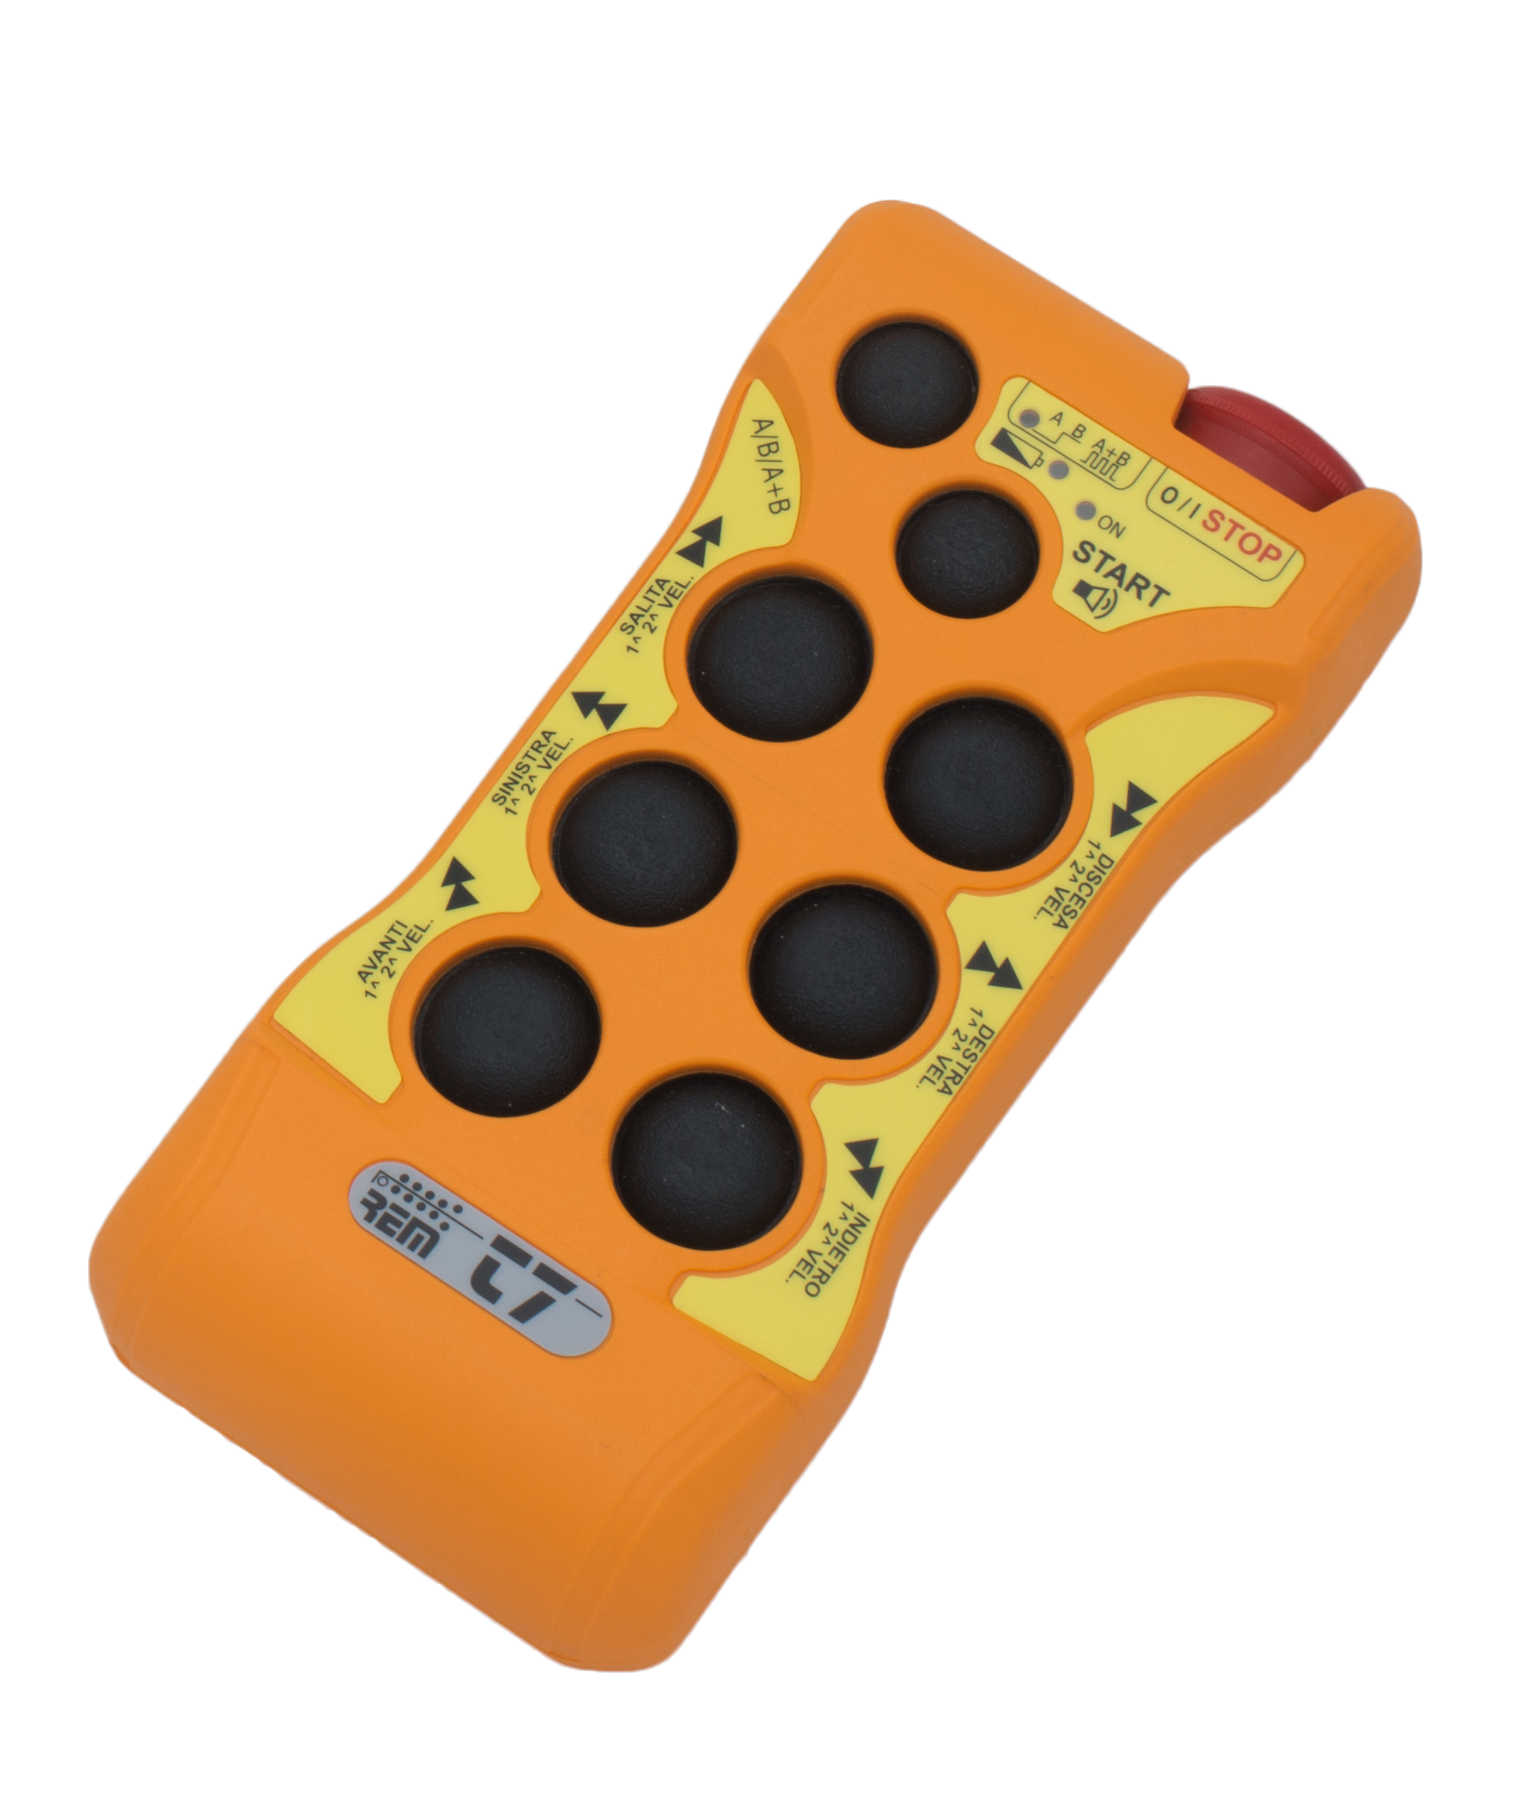 T Series - T3 - T5 - T7 Radio Remote Control